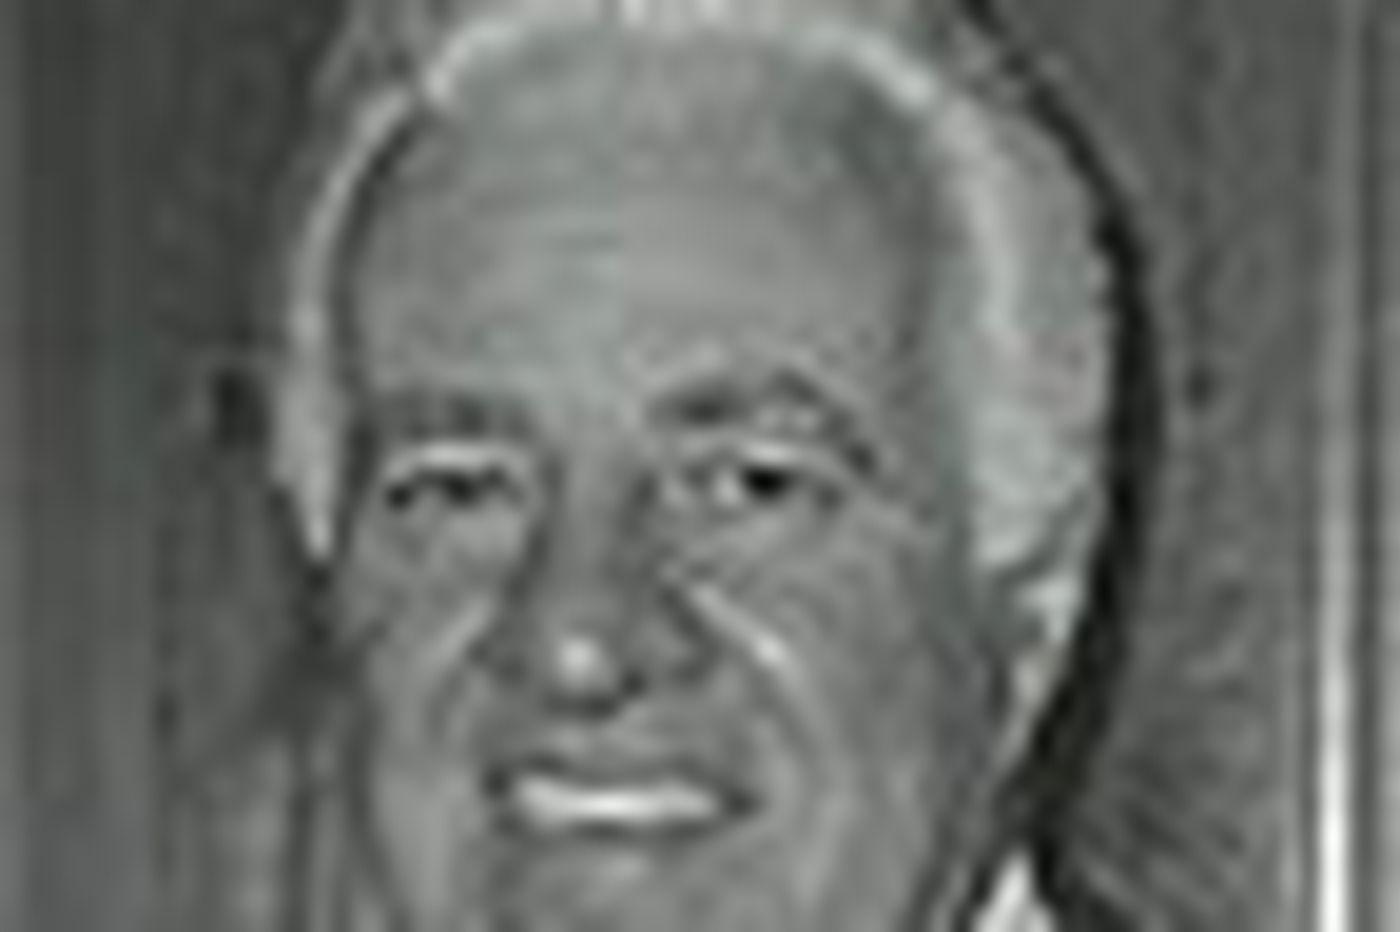 Michael J. Dougherty, 83, former PIDC senior vice president